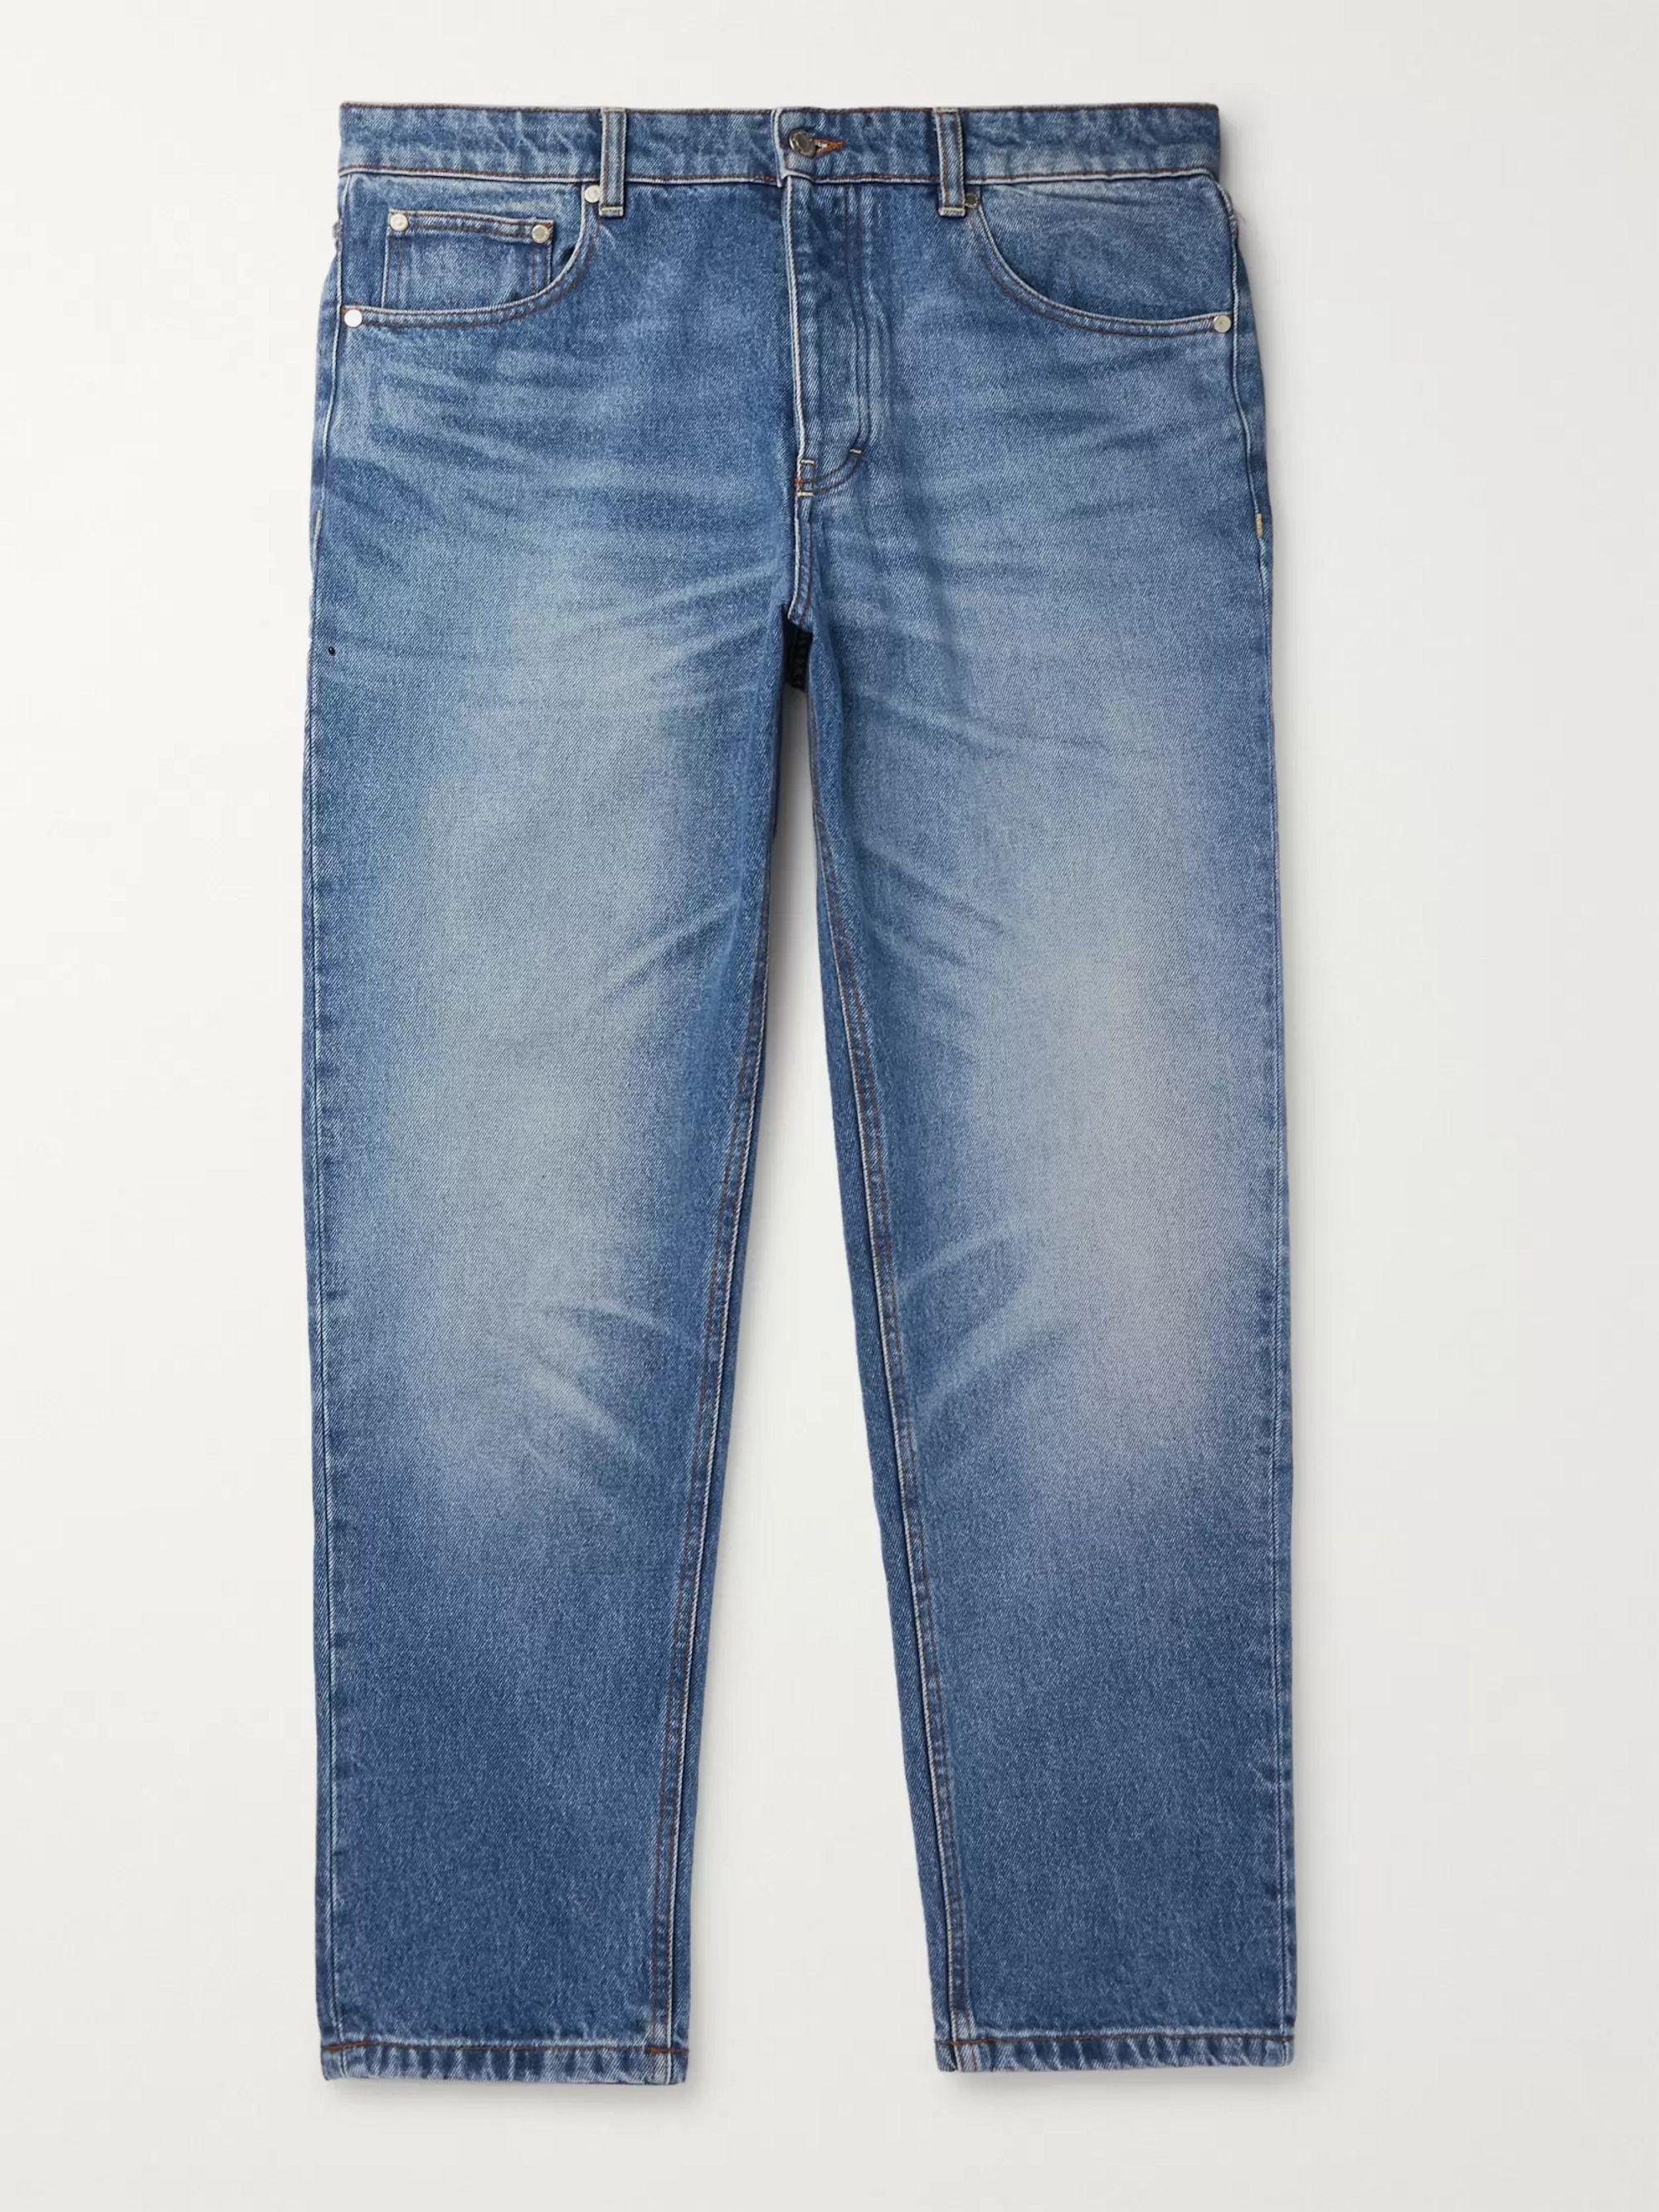 AMI Blue Tapered Denim Jeans,Blue